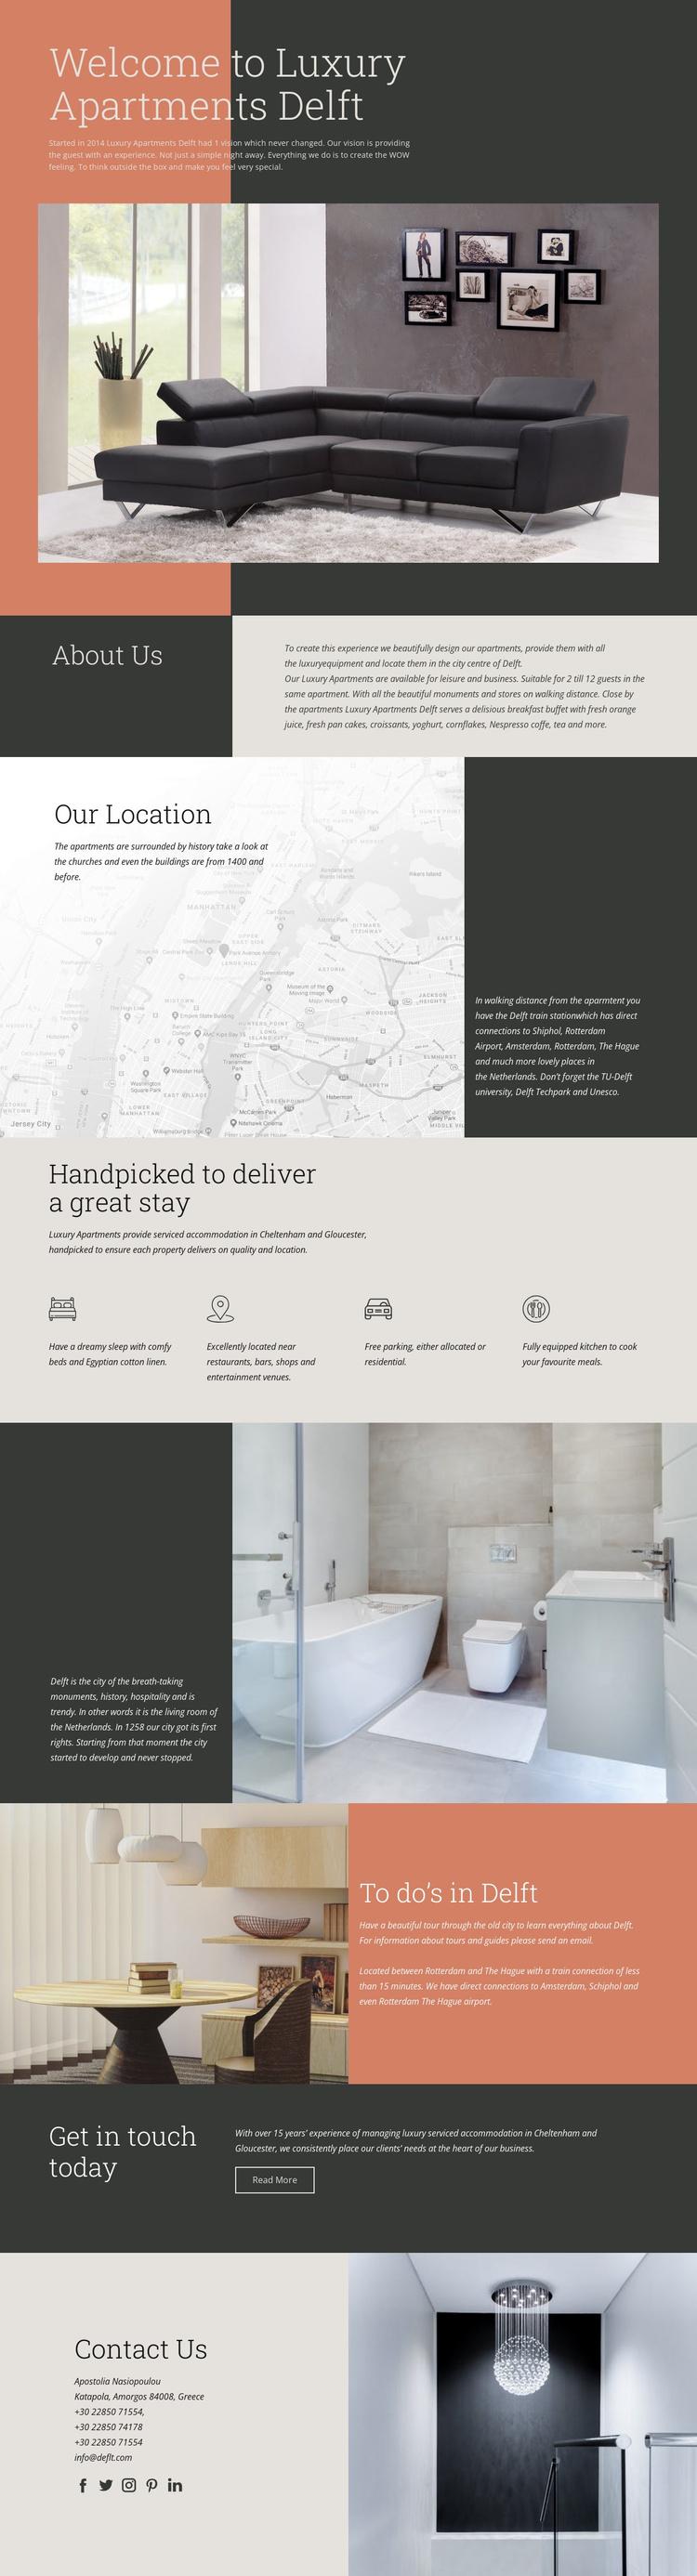 Luxury Apartments Joomla Template